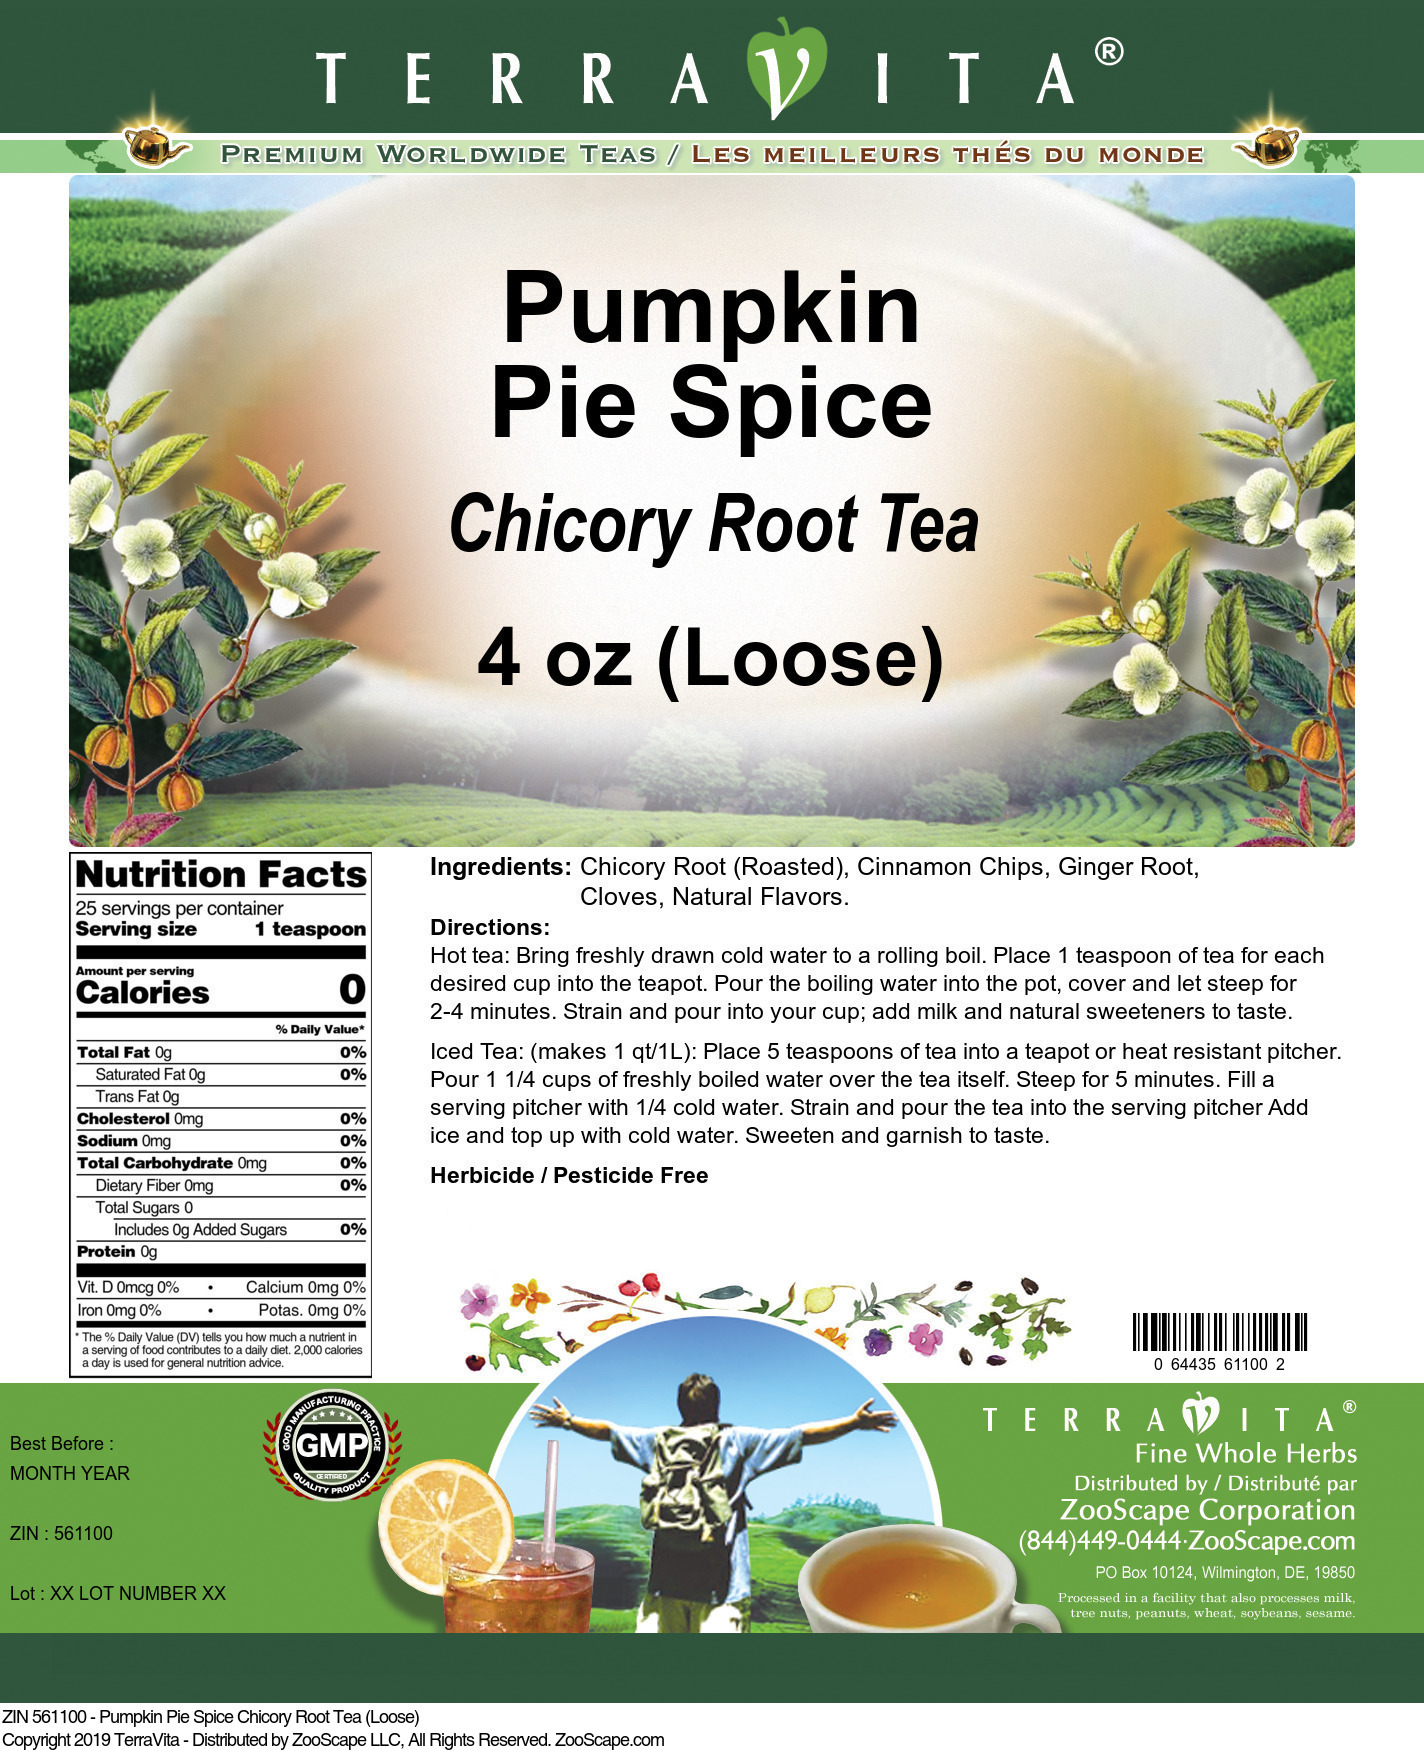 Pumpkin Pie Spice Chicory Root Tea (Loose)